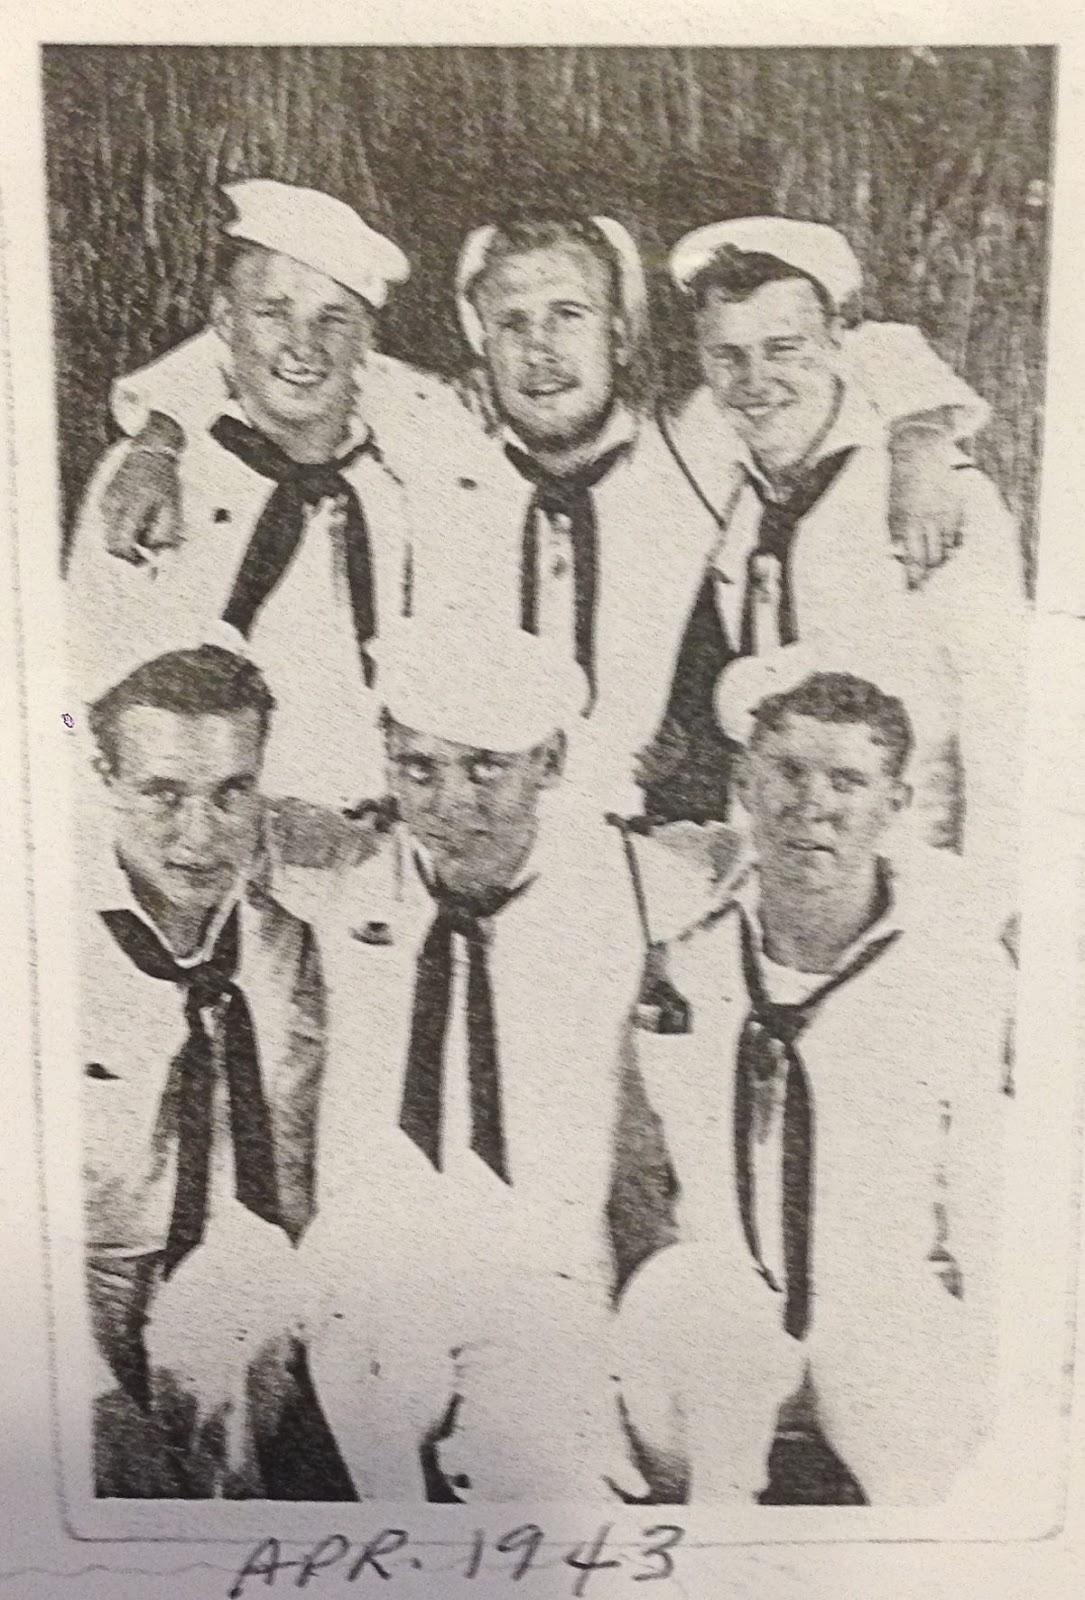 Lee Bergmeier Gun Crew Apr 1943.jpg